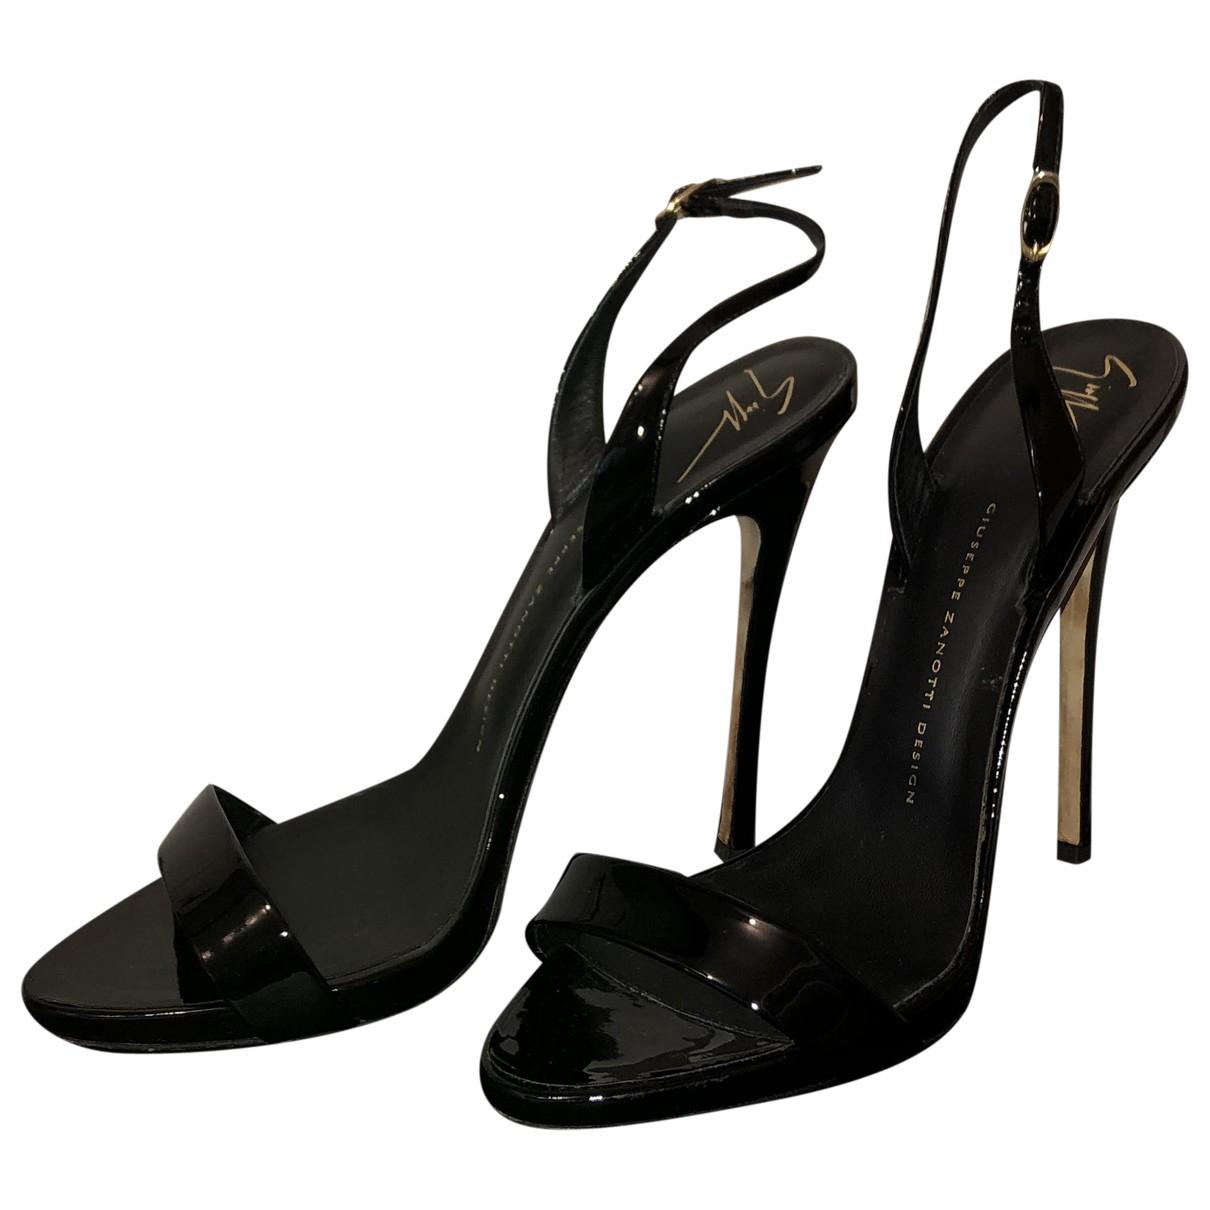 Giuseppe Zanotti \N Black Patent leather Sandals for Women 39.5 EU